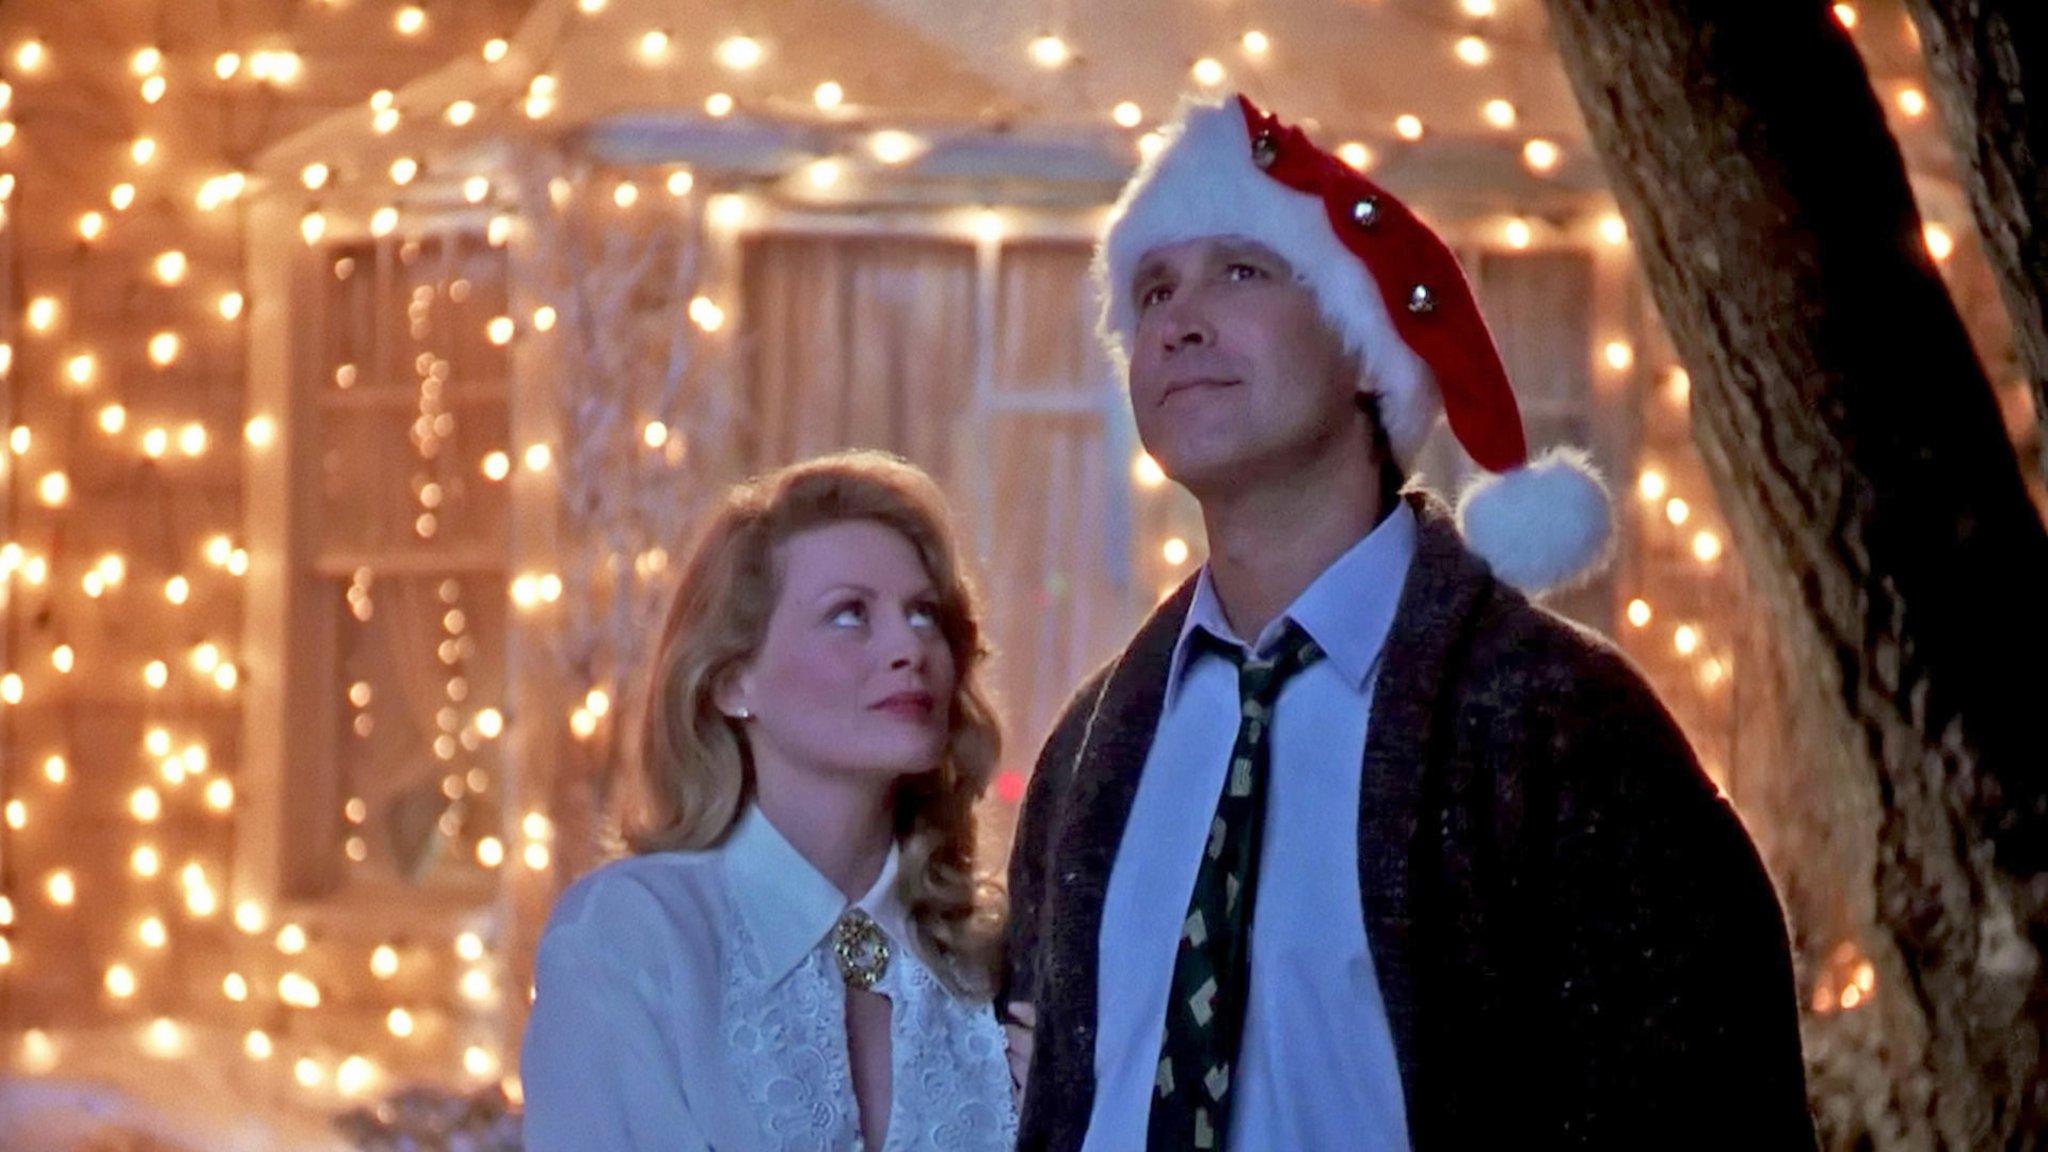 national lampoon christmas vacation, clark griswold style, national lampoon christmas vacation movie, ugly sweater party style, ugly sweater party